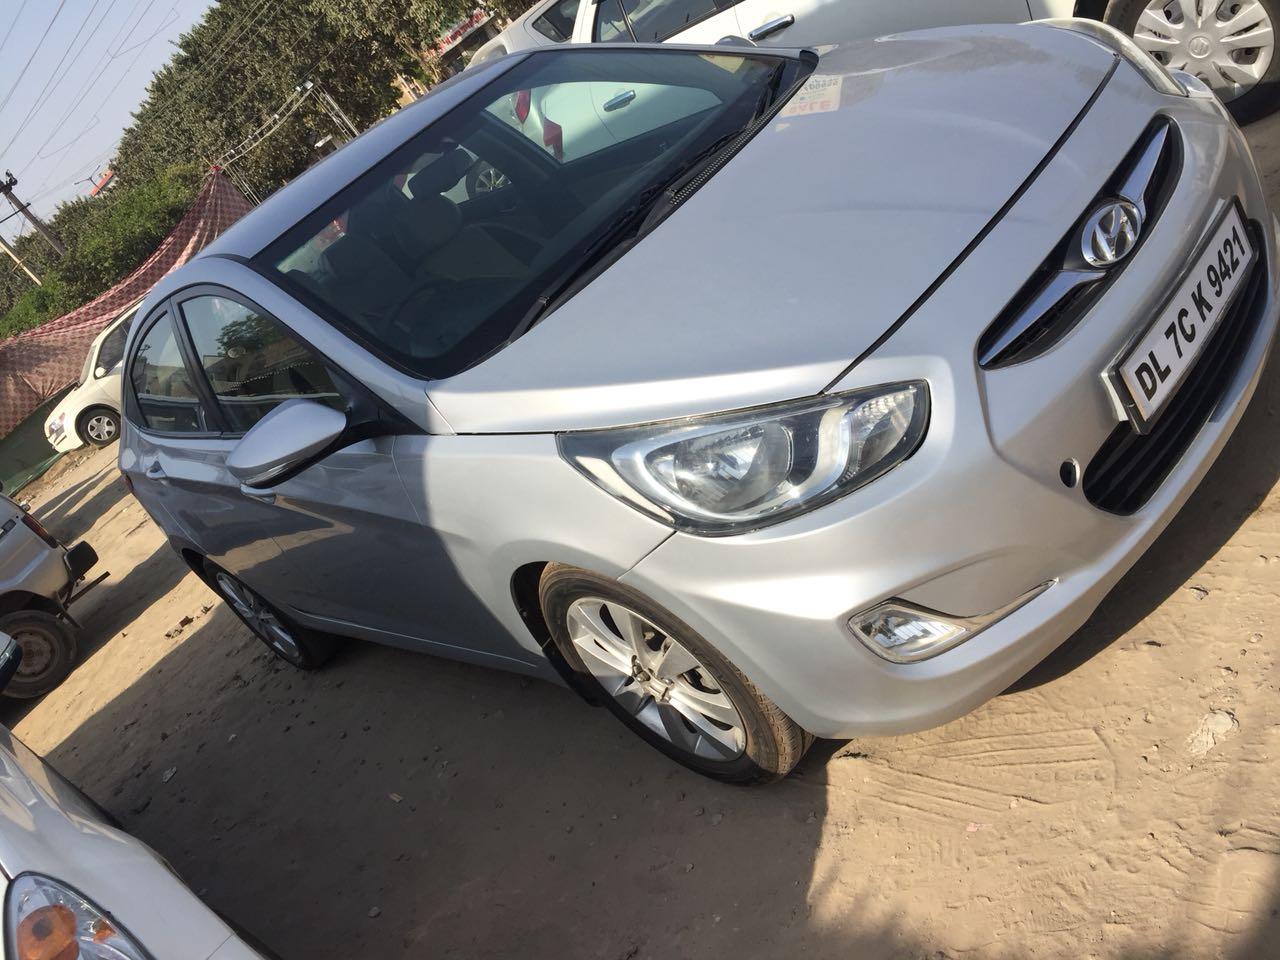 Used Verna fludic-Sx Hyundai in Delhi